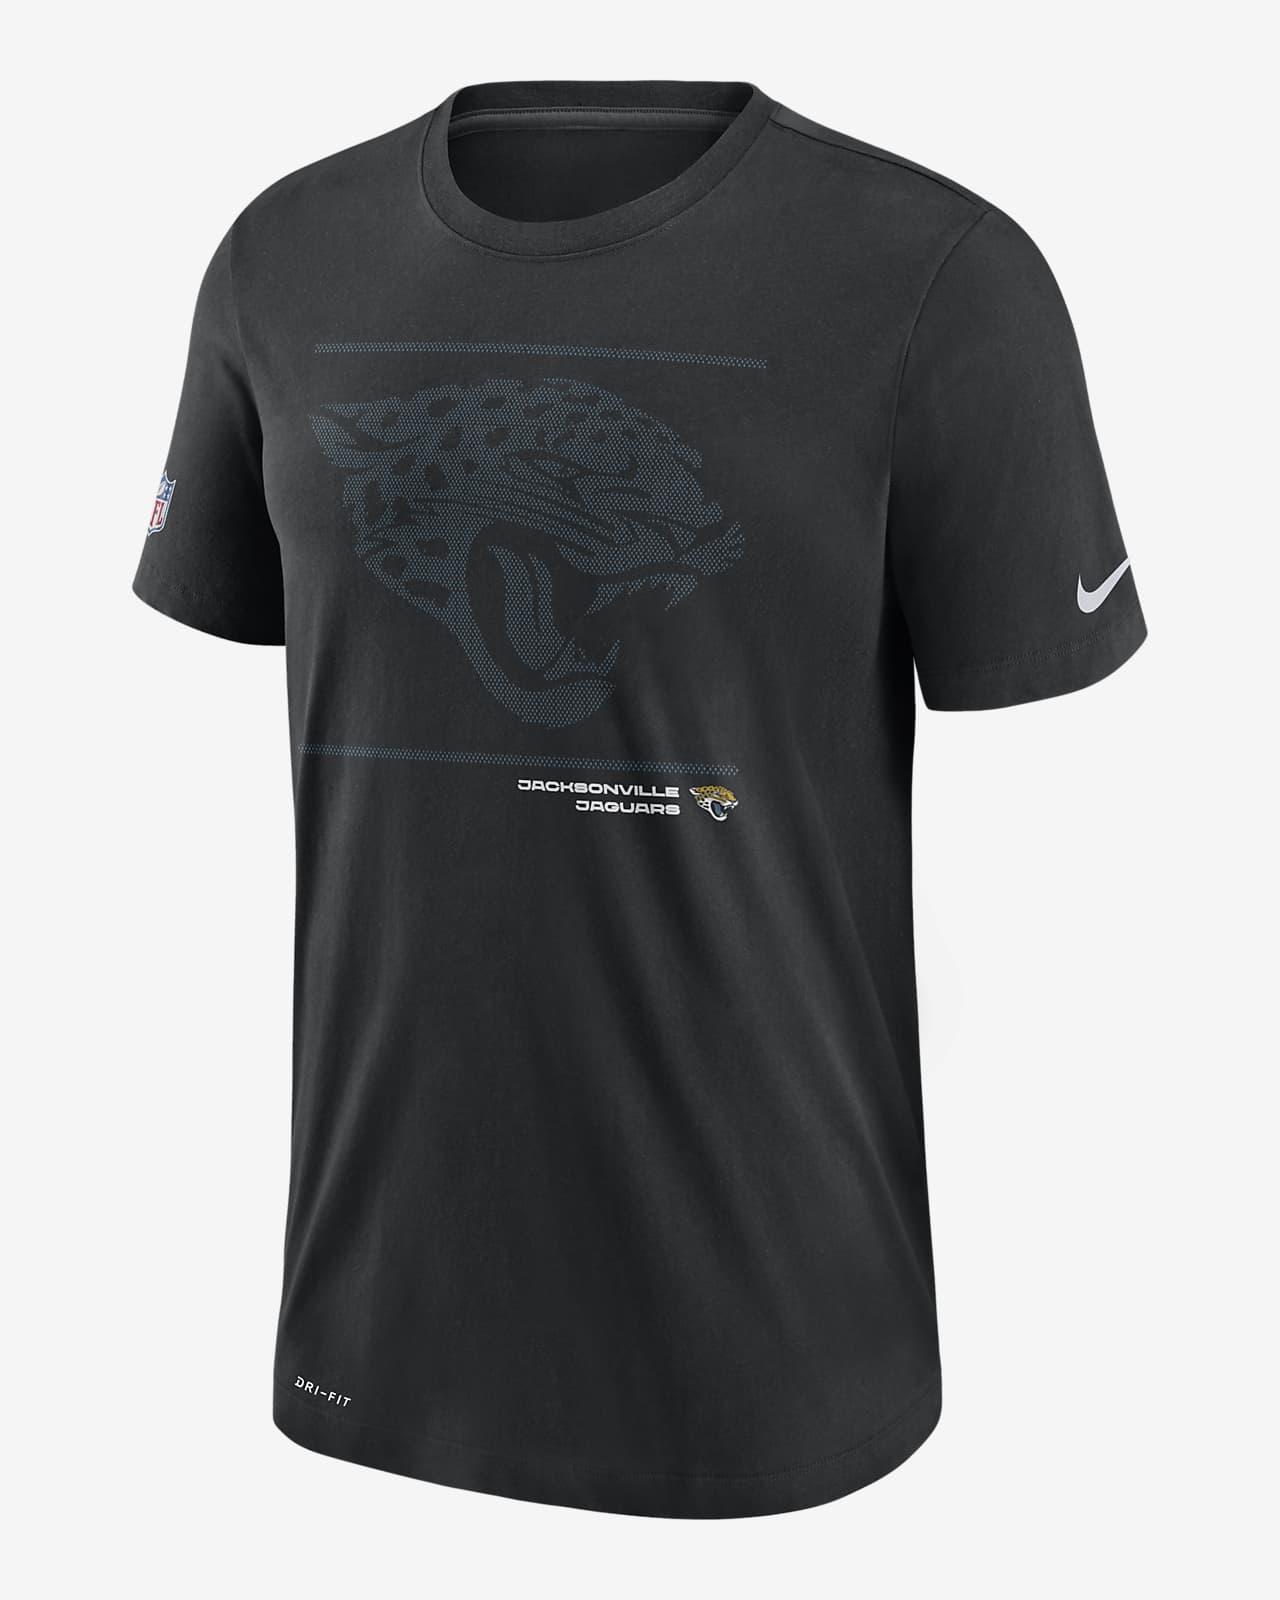 Nike Dri-FIT Sideline Team Issue (NFL Jacksonville Jaguars) Men's T-Shirt